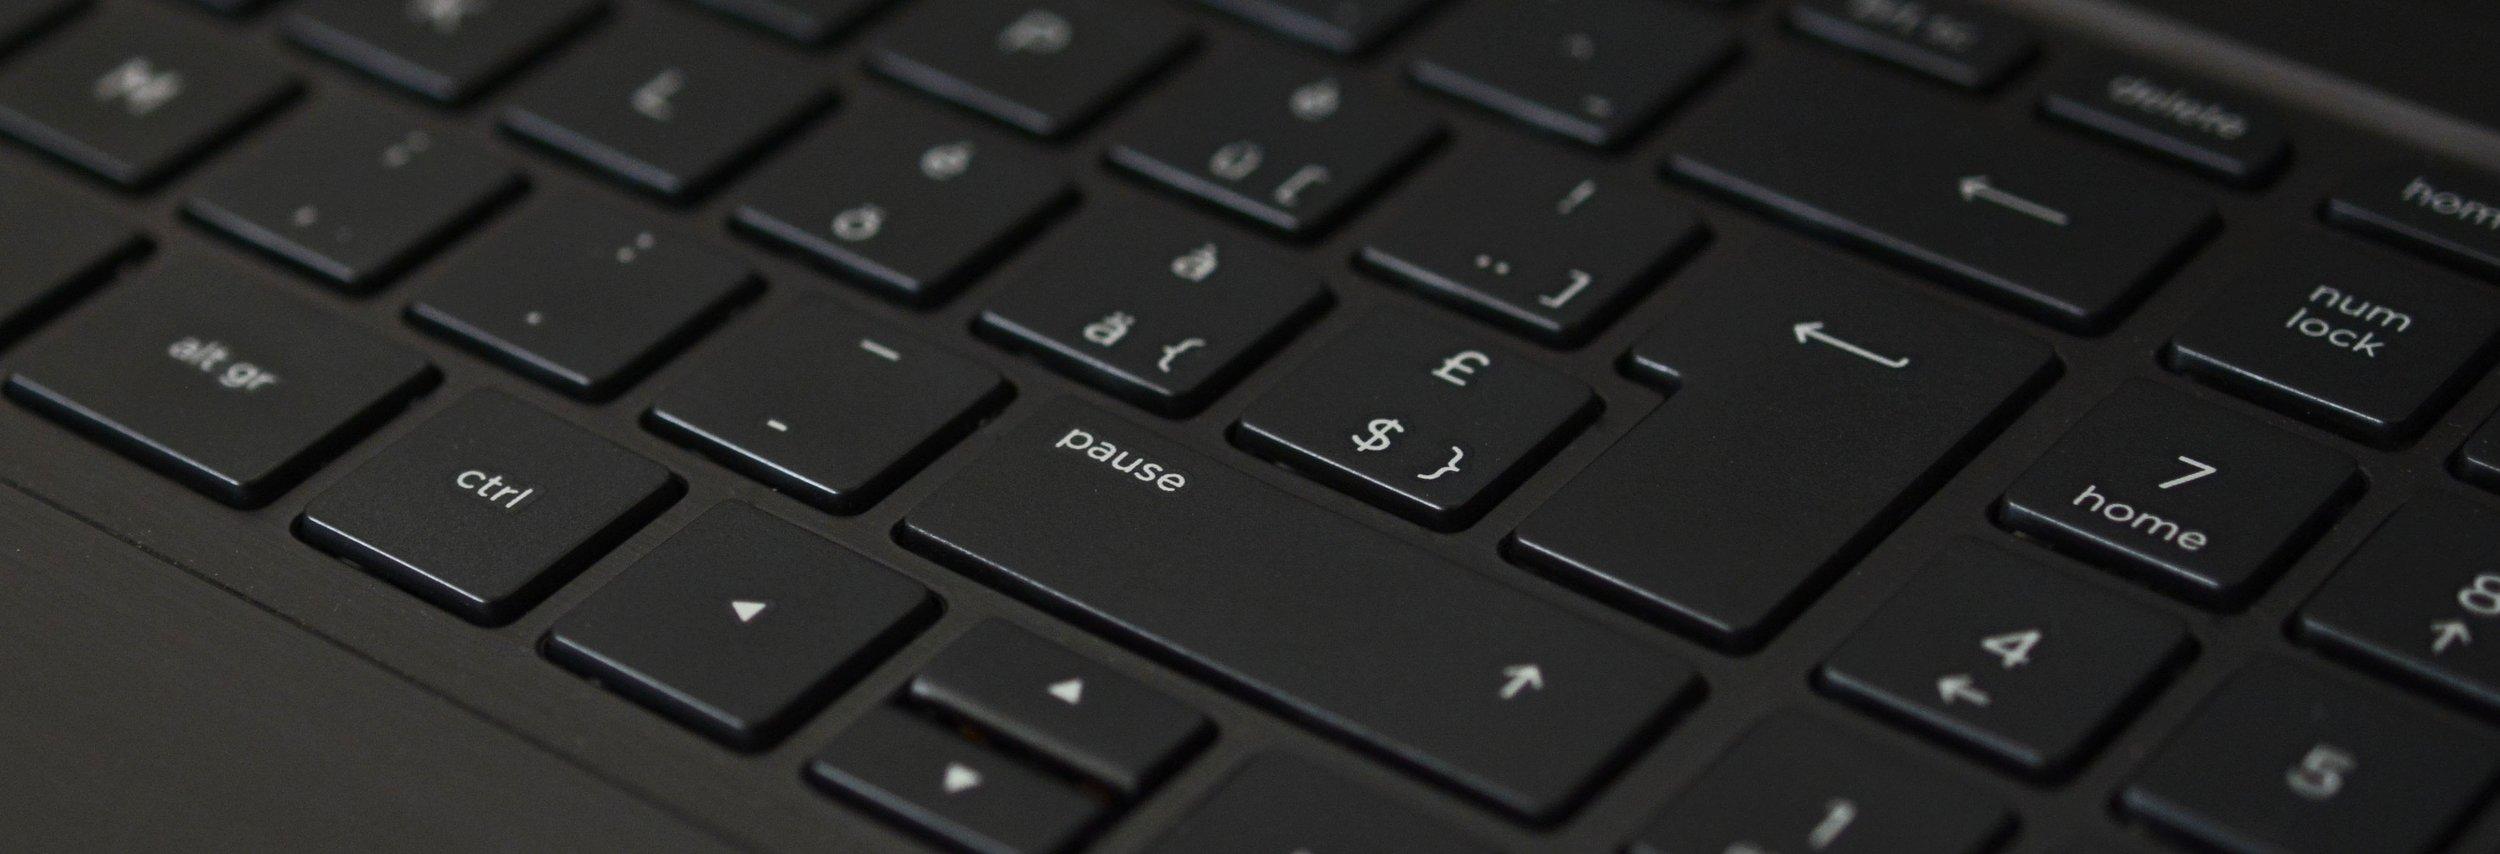 keyboard-black-notebook-input-163130.jpeg